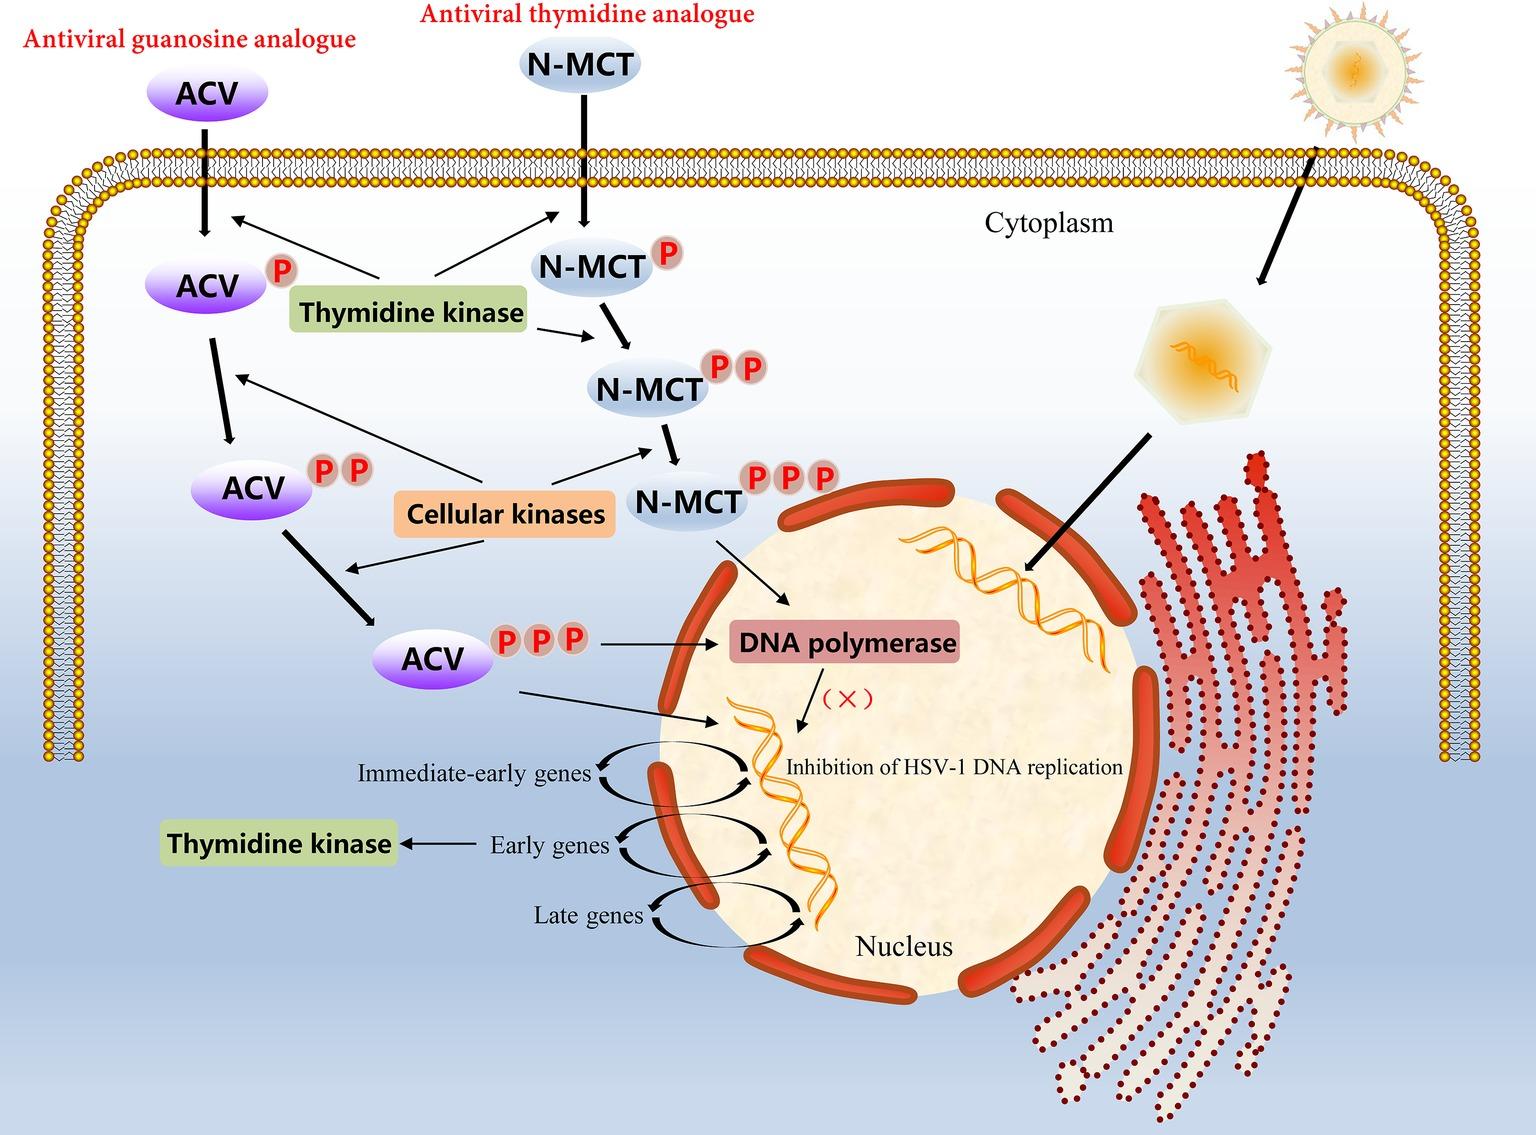 Frontiers | Alpha-Herpesvirus Thymidine Kinase Genes Mediate Viral